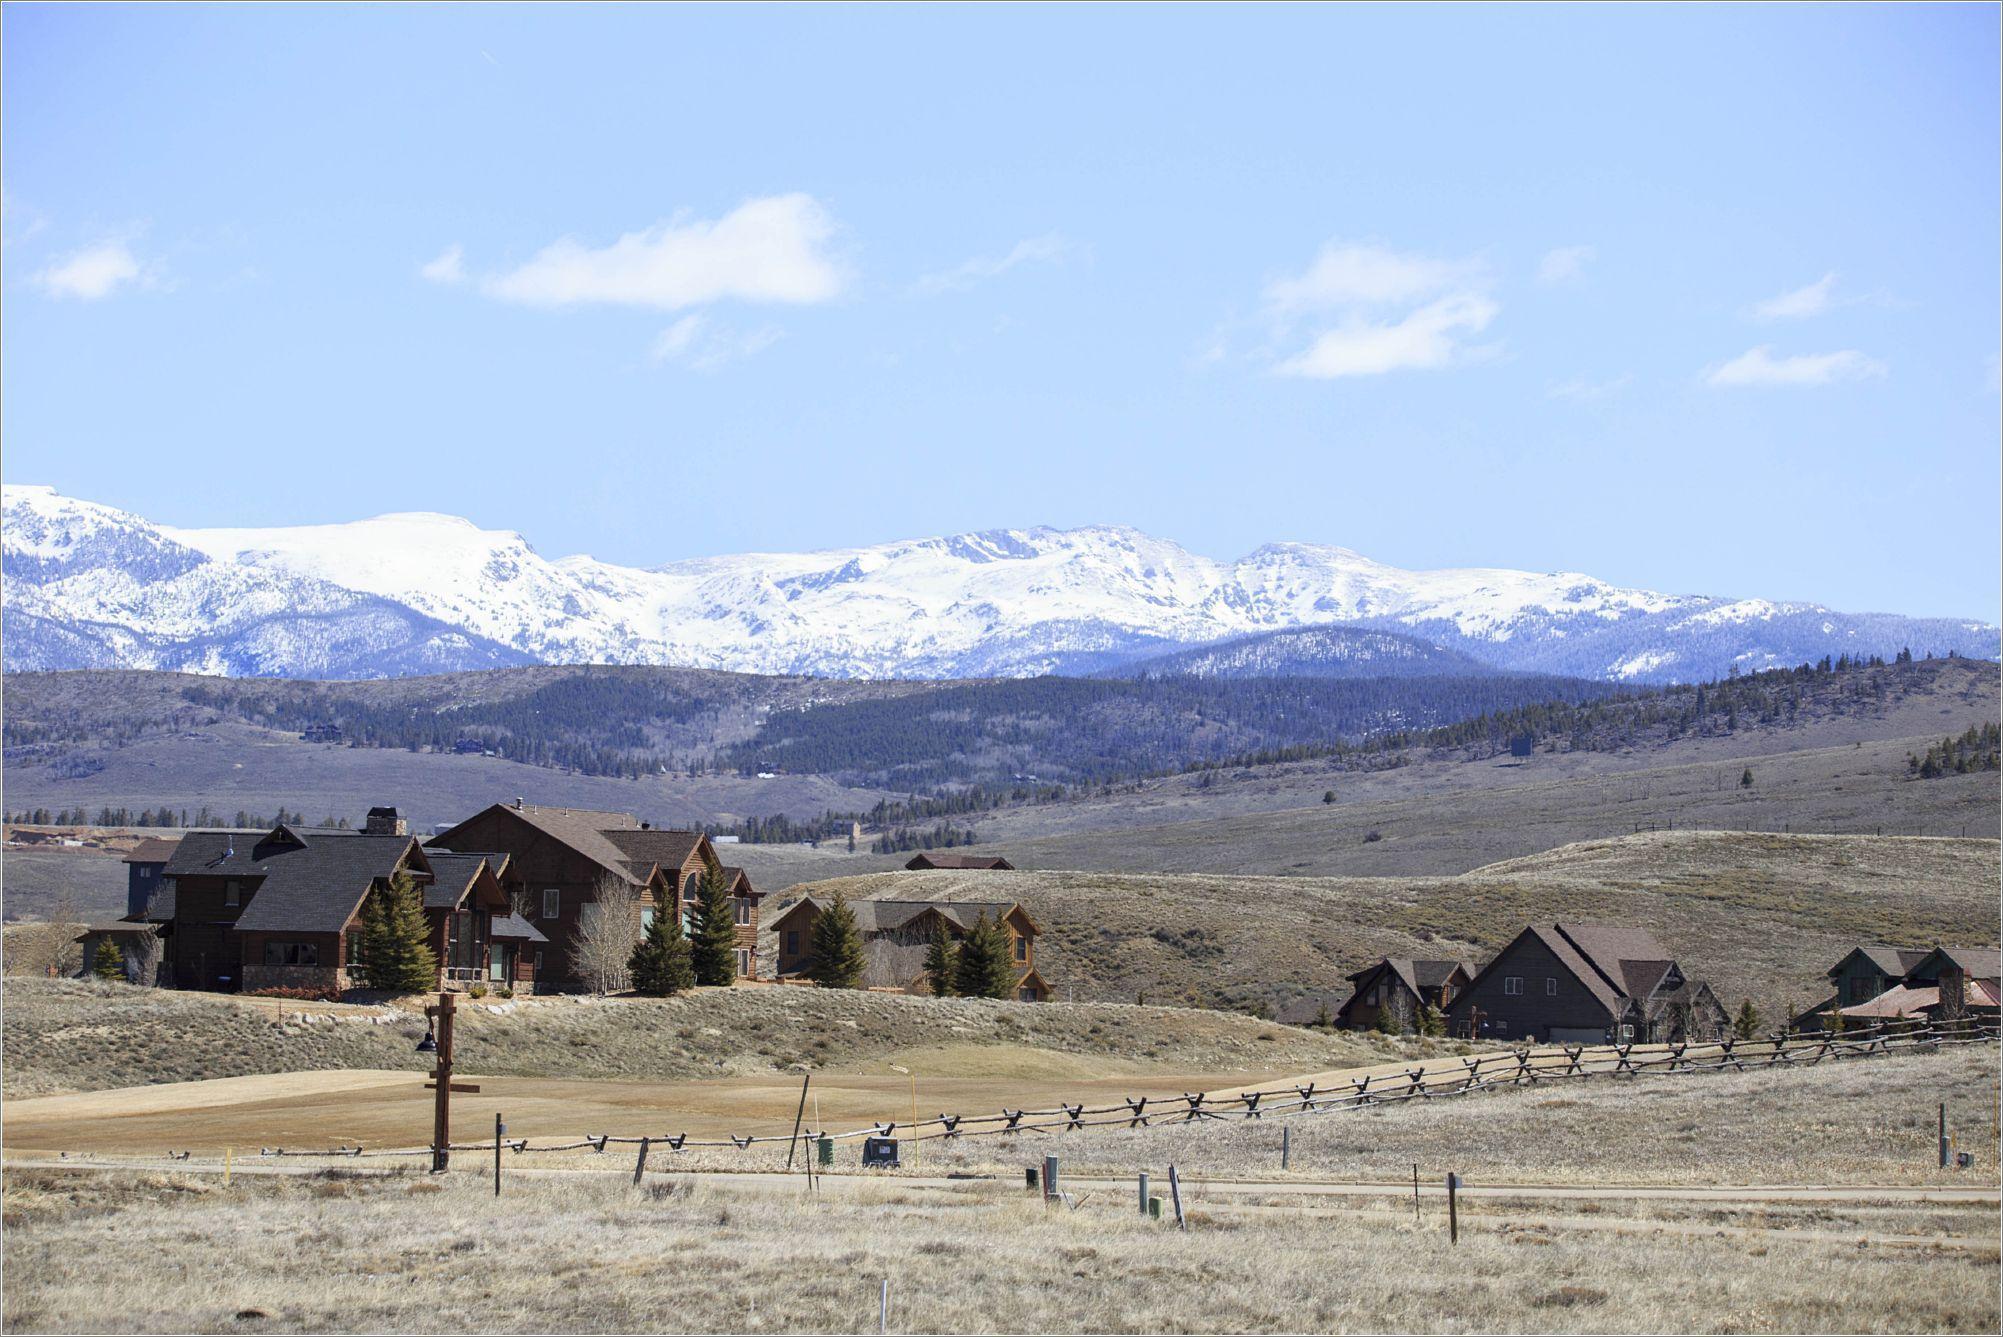 'Koelbel at Grand Elk' by Koelbel at Grand Elk in Boulder-Longmont